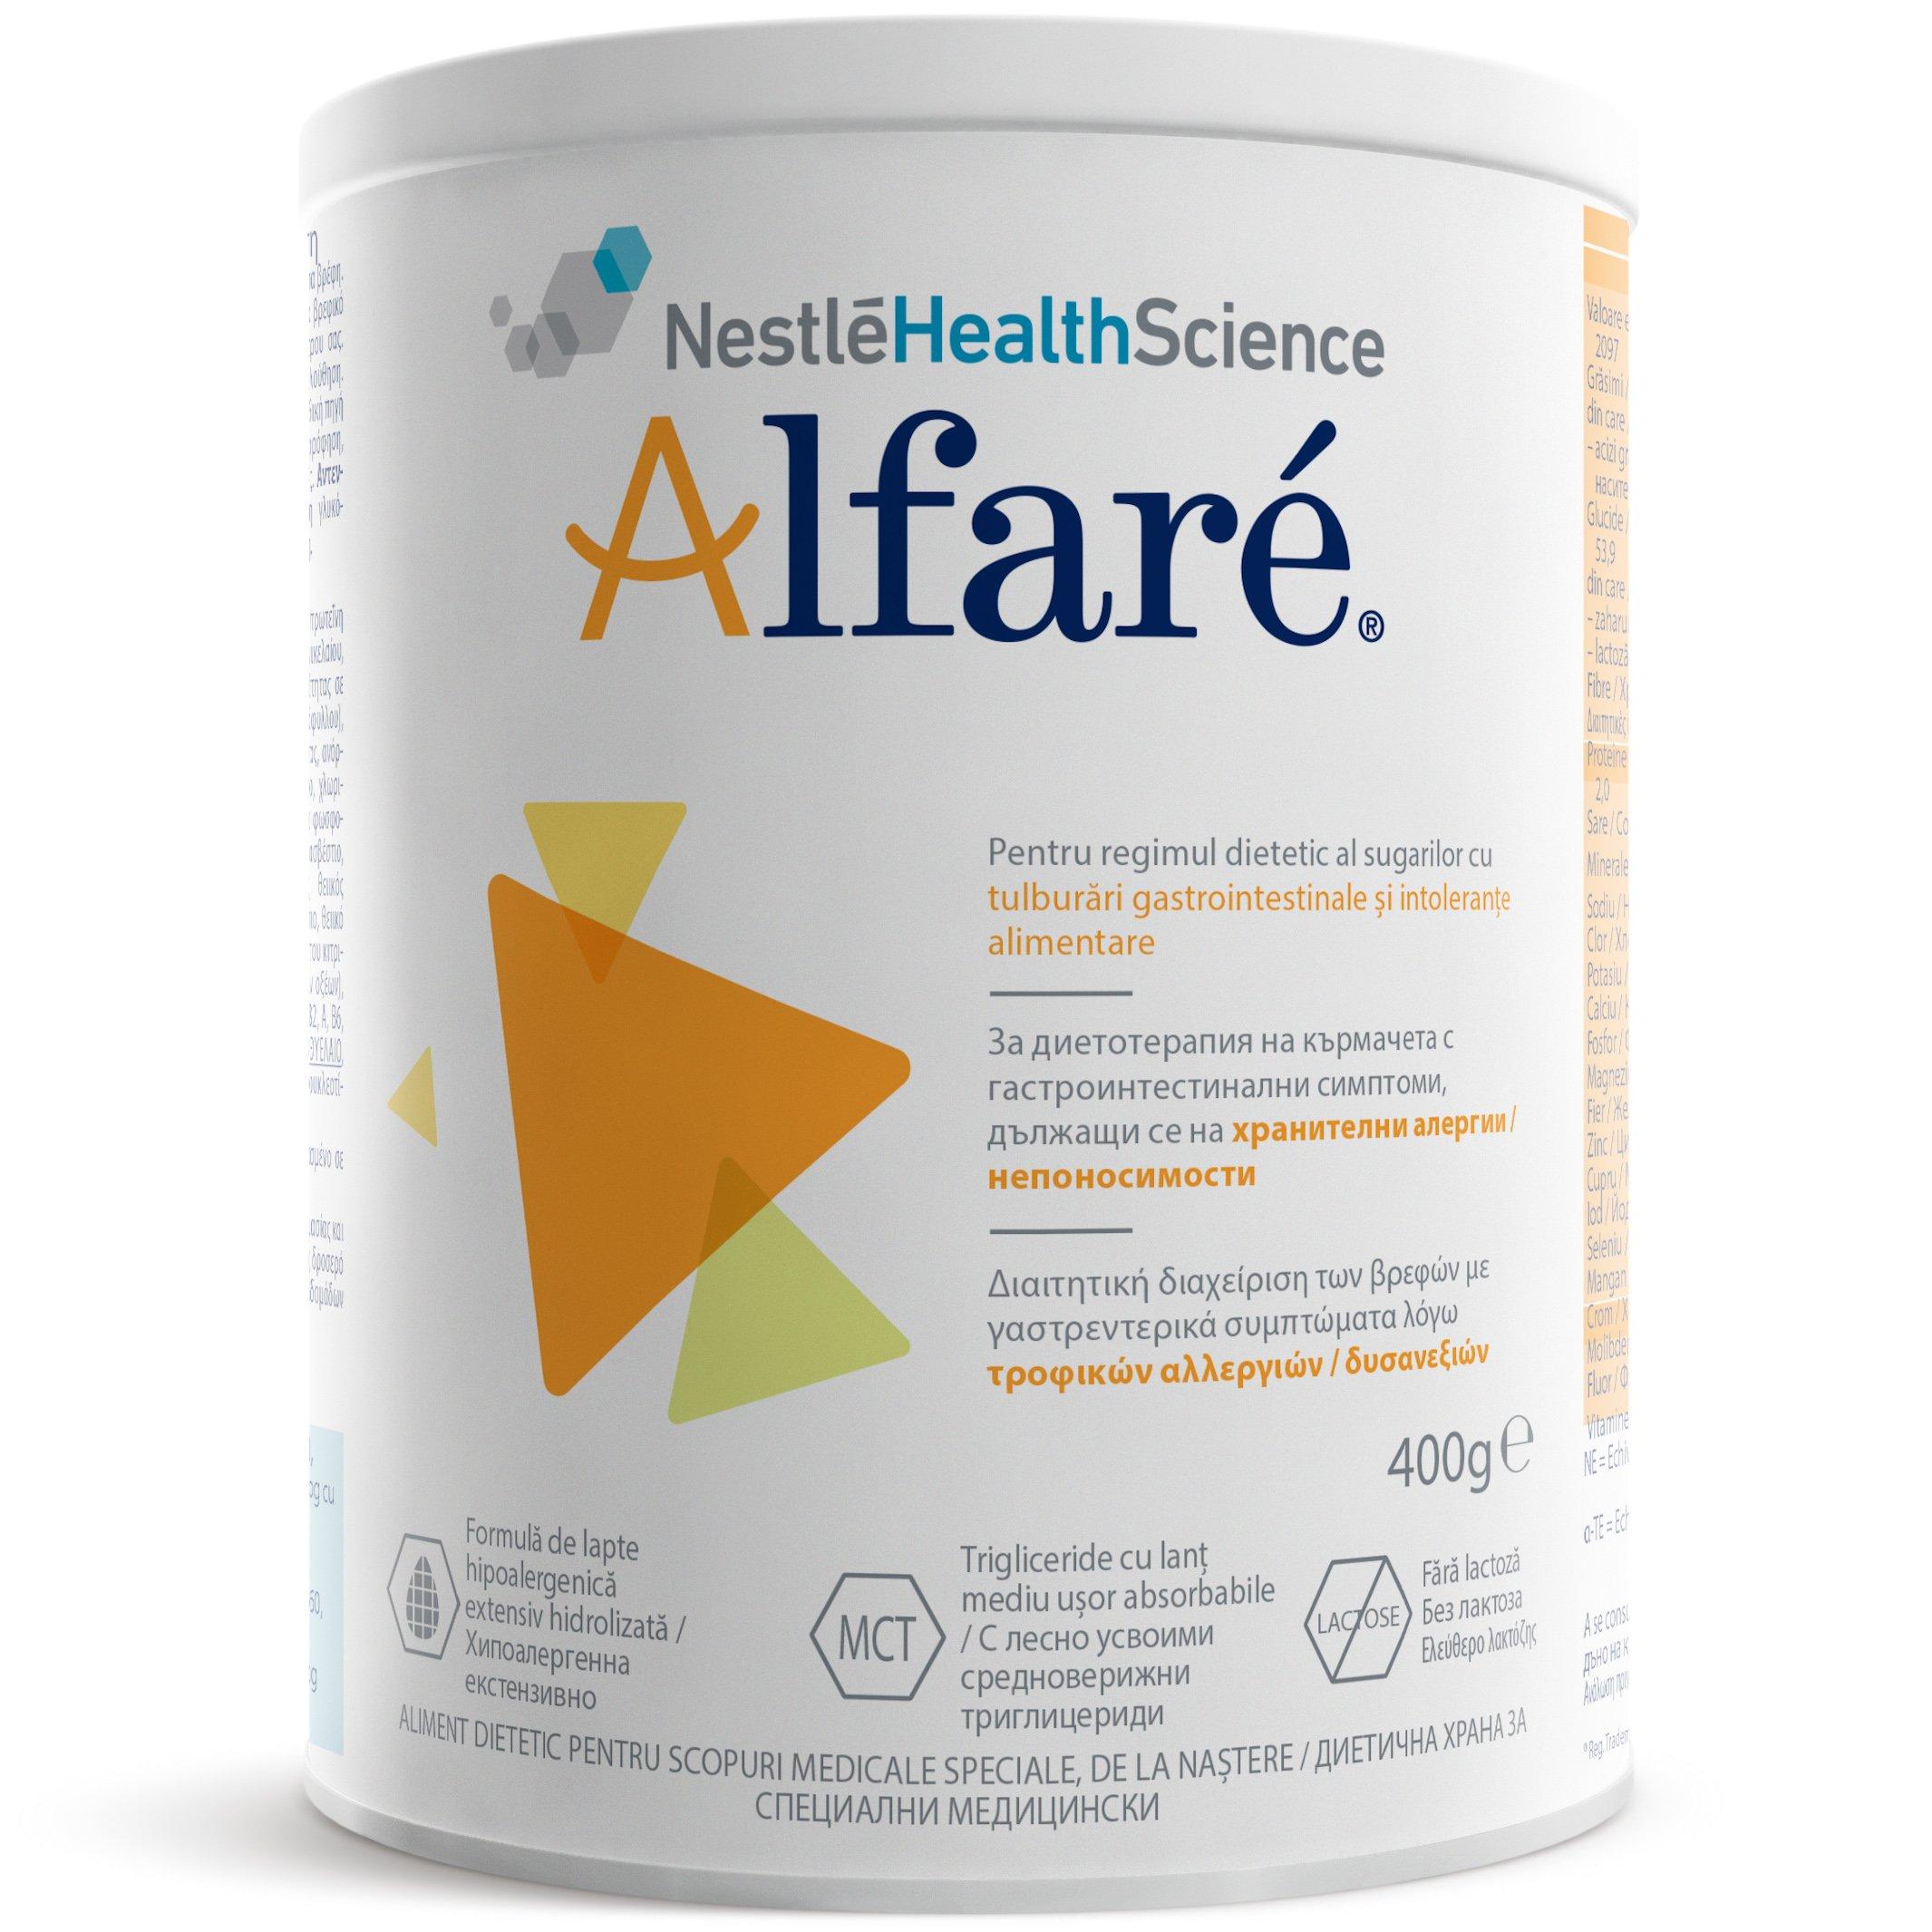 Nestle Alfare Διαιτητική Διαχείριση Βρεφών με Γαστρεντερικά Συμπτώματα Λόγω Τροφικών Αλλεργιών/Δυσανεξιών, από τη Γέννηση 400gr